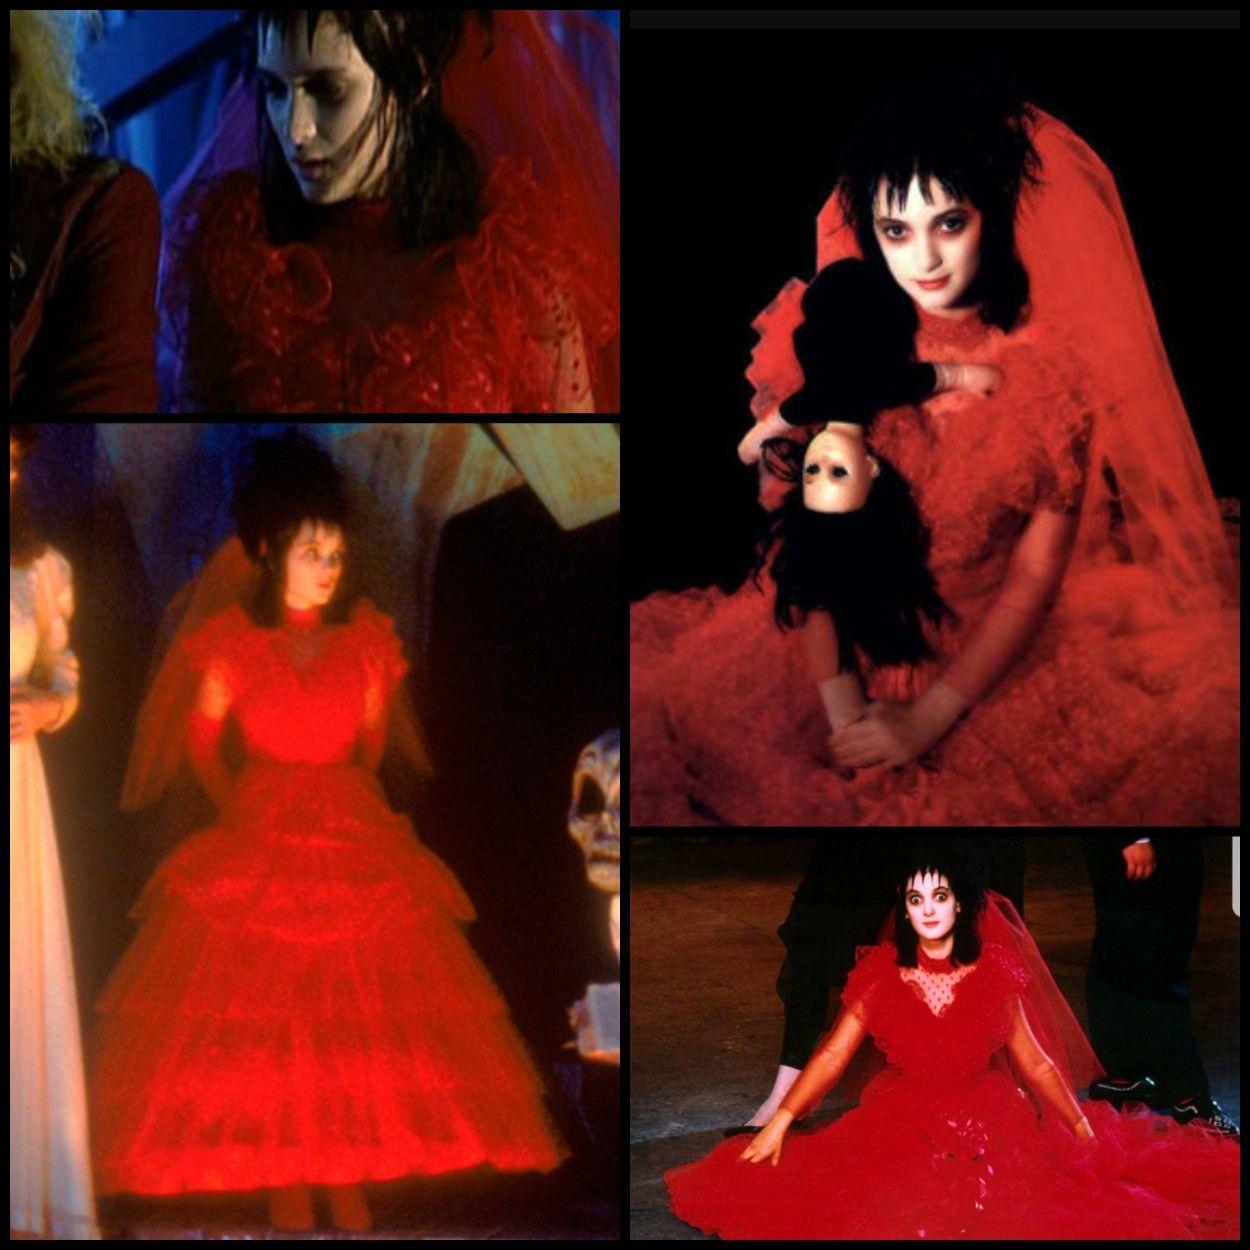 Lydia Deetz Red Wedding Dress Beetlejuice Wedding Beetlejuice Halloween Costume Lydia Deetz Costume